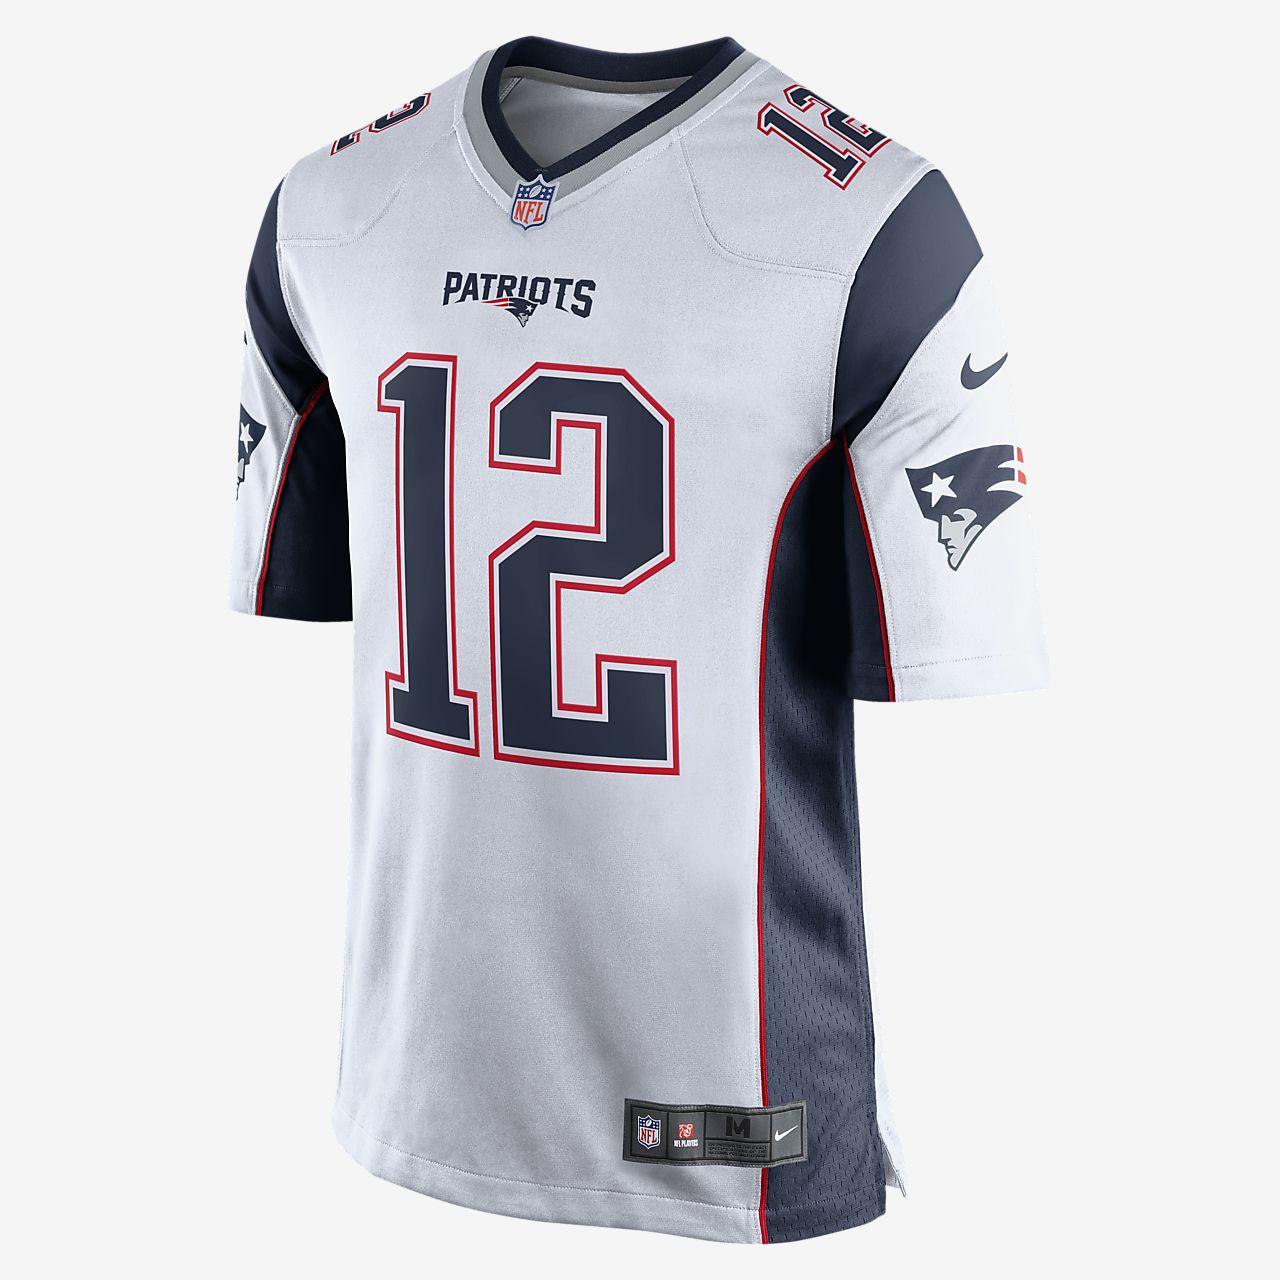 d12c893fdf6f8 ... Camiseta oficial de fútbol americano de visitante para hombre de NFL  New England Patriots (Tom